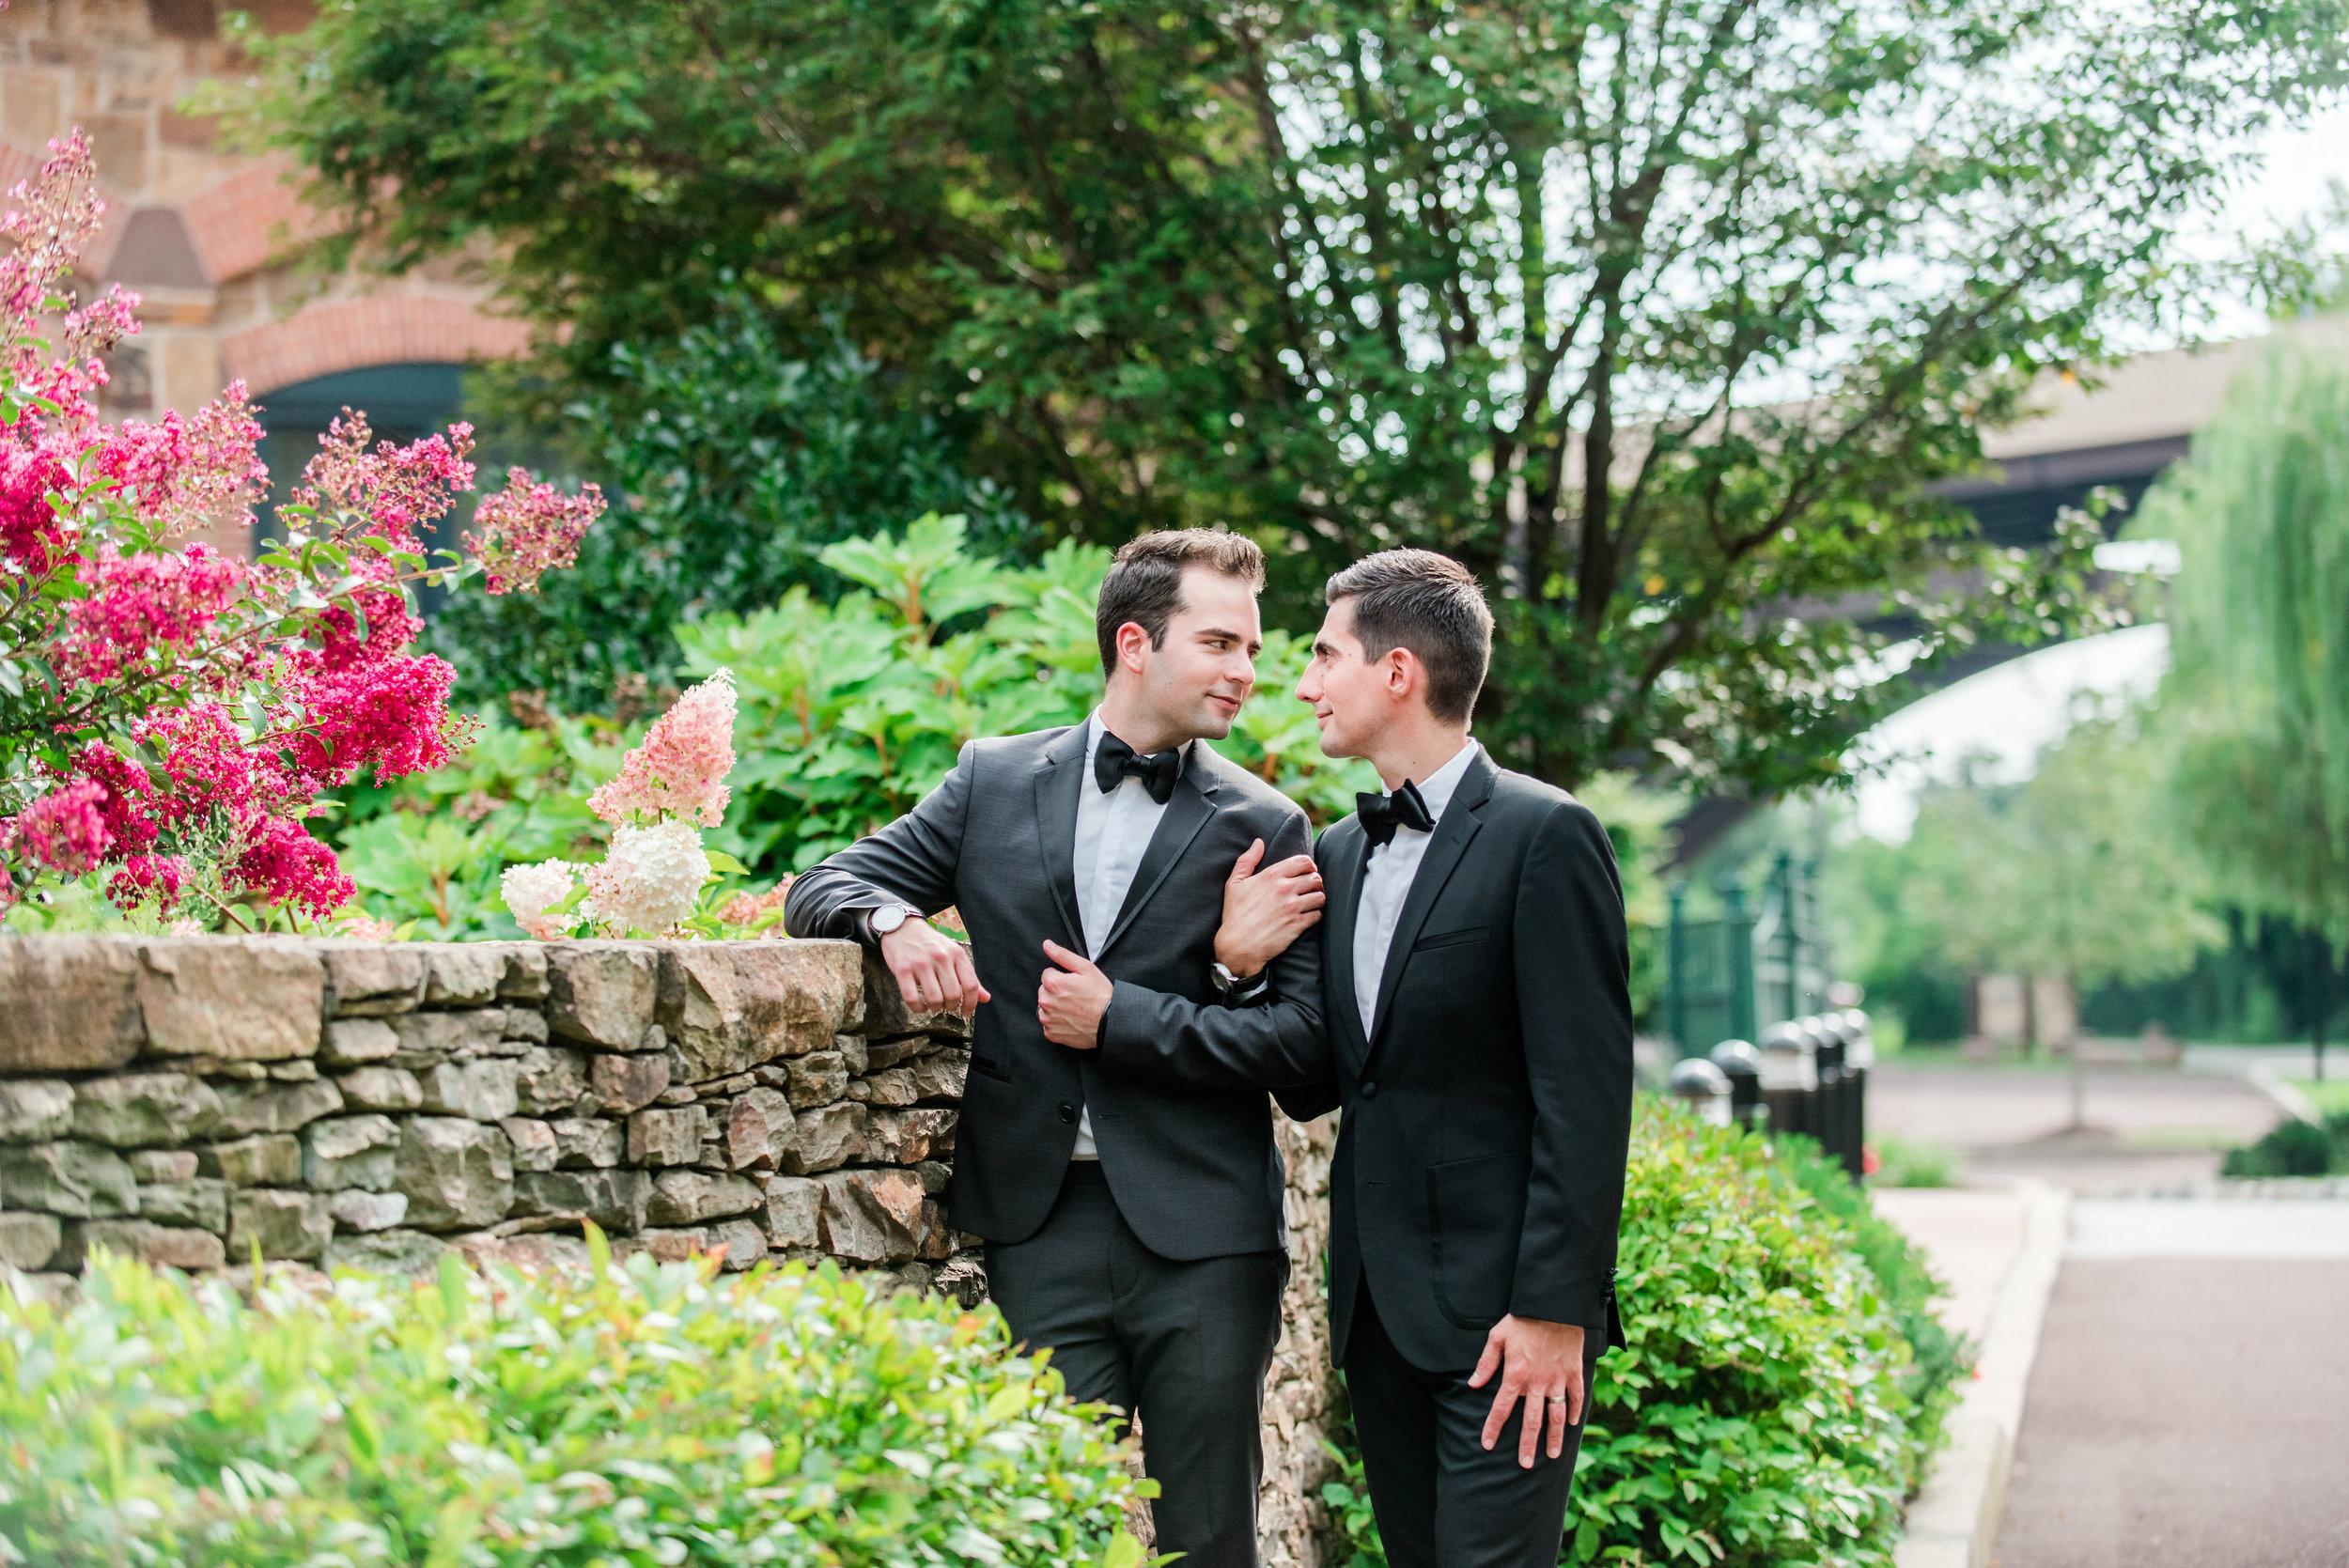 Wedding-Photographer-The-Foundry-Pheonixville-Pennsylvania-Andrea-Krout-Photography-300.jpg